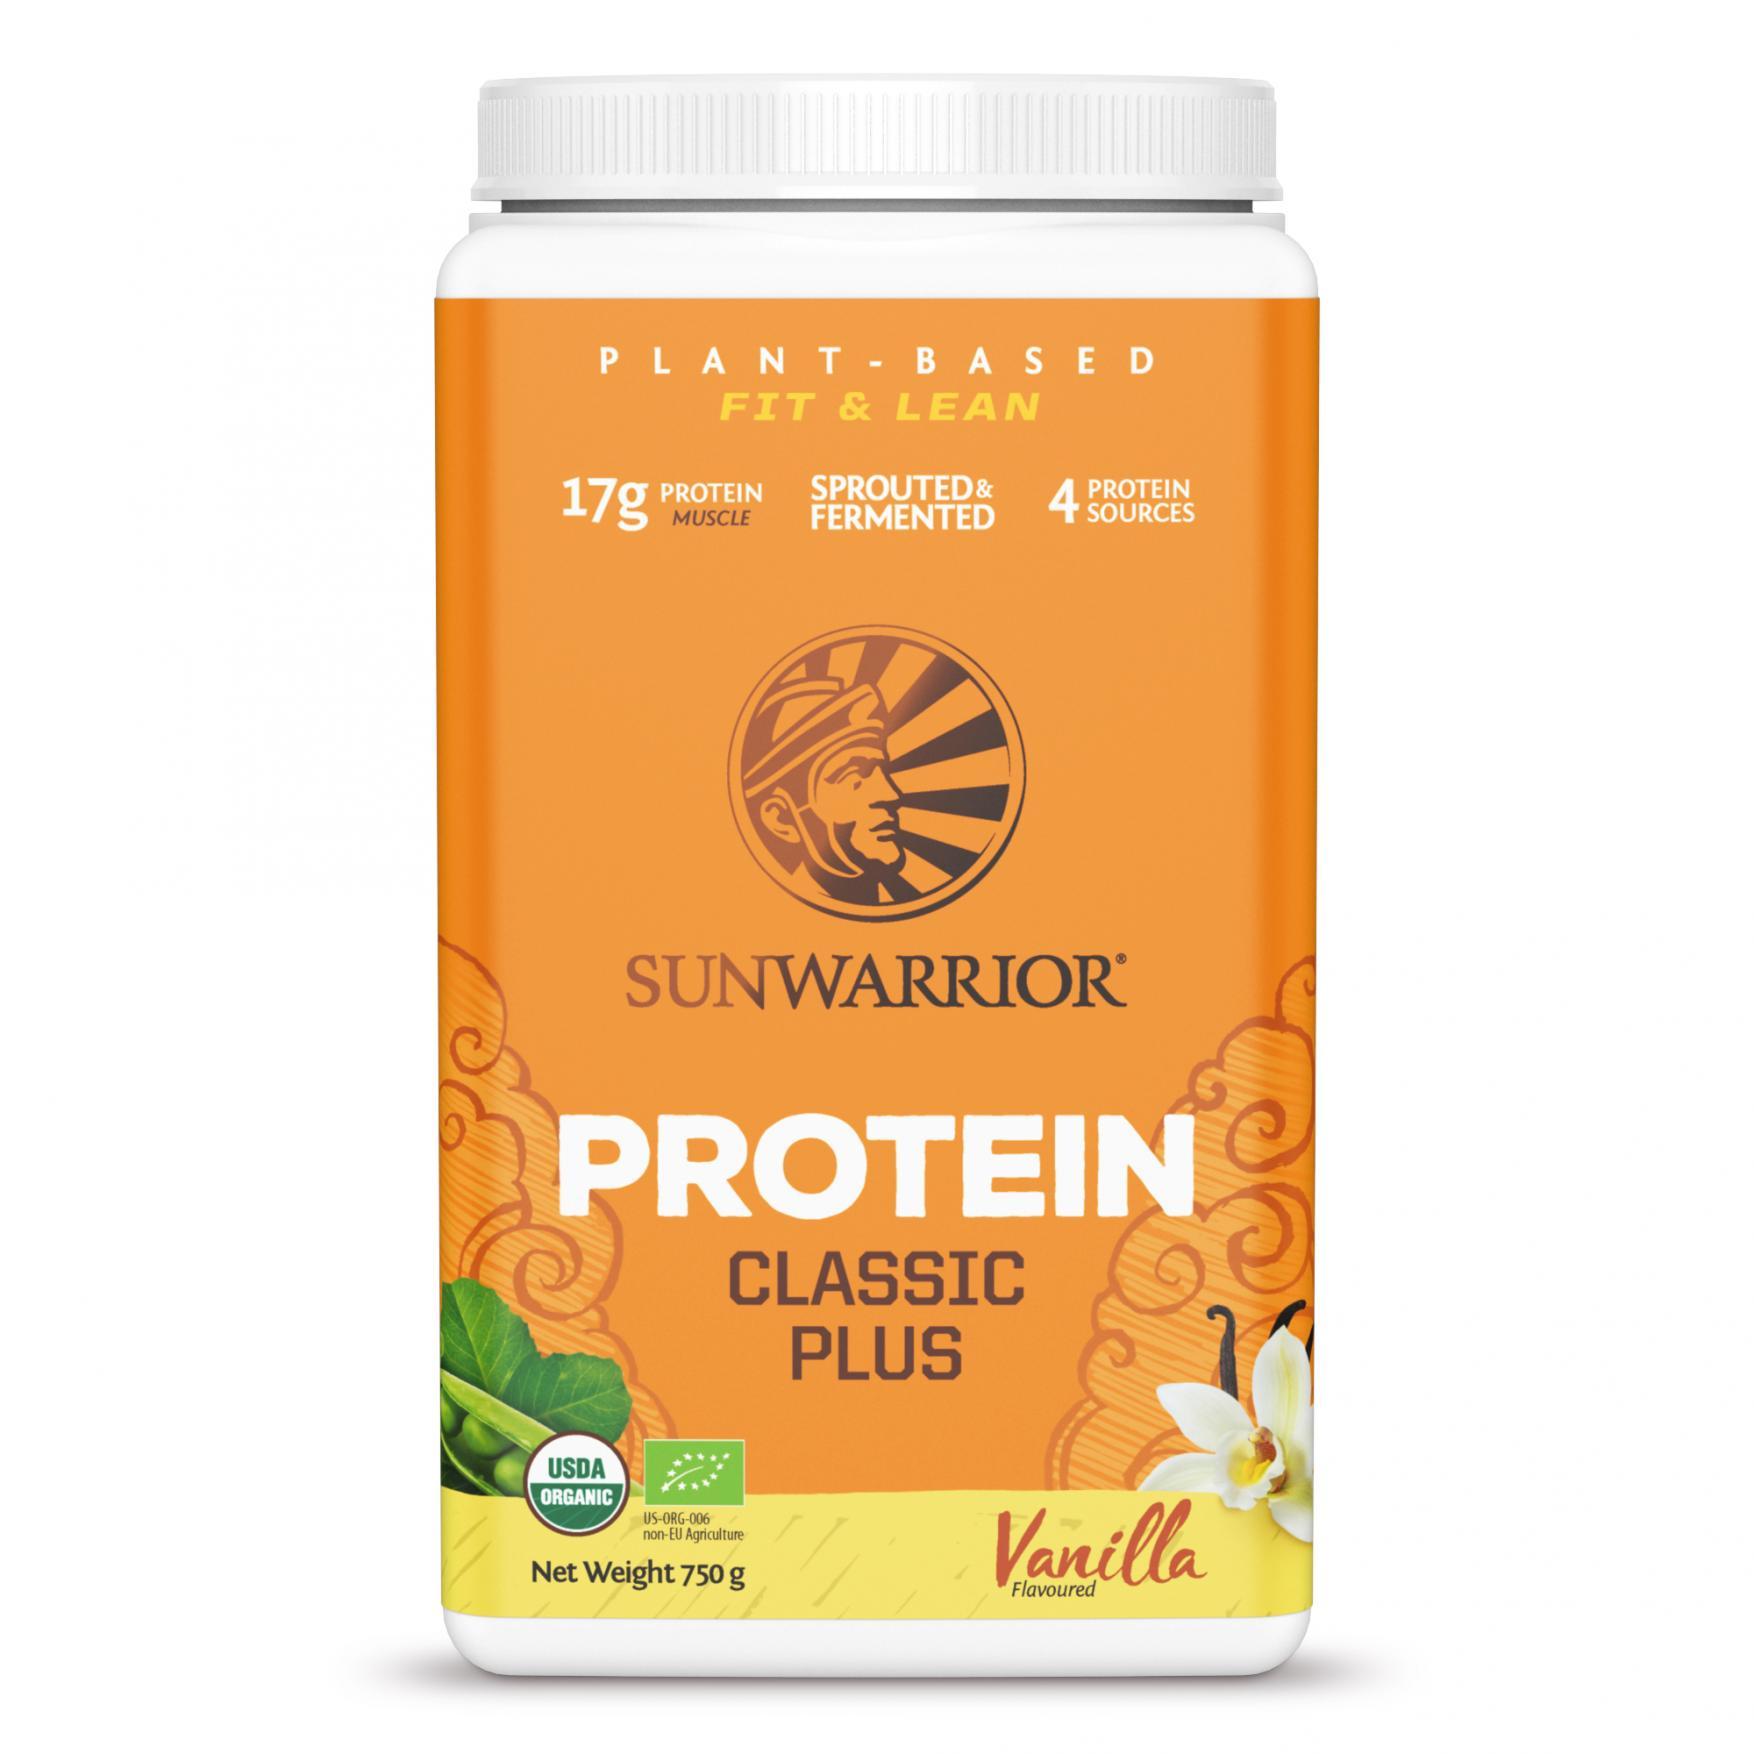 Protein Classic Plus Vanilla 750g (Orange Tub) (Currently Unavailable)